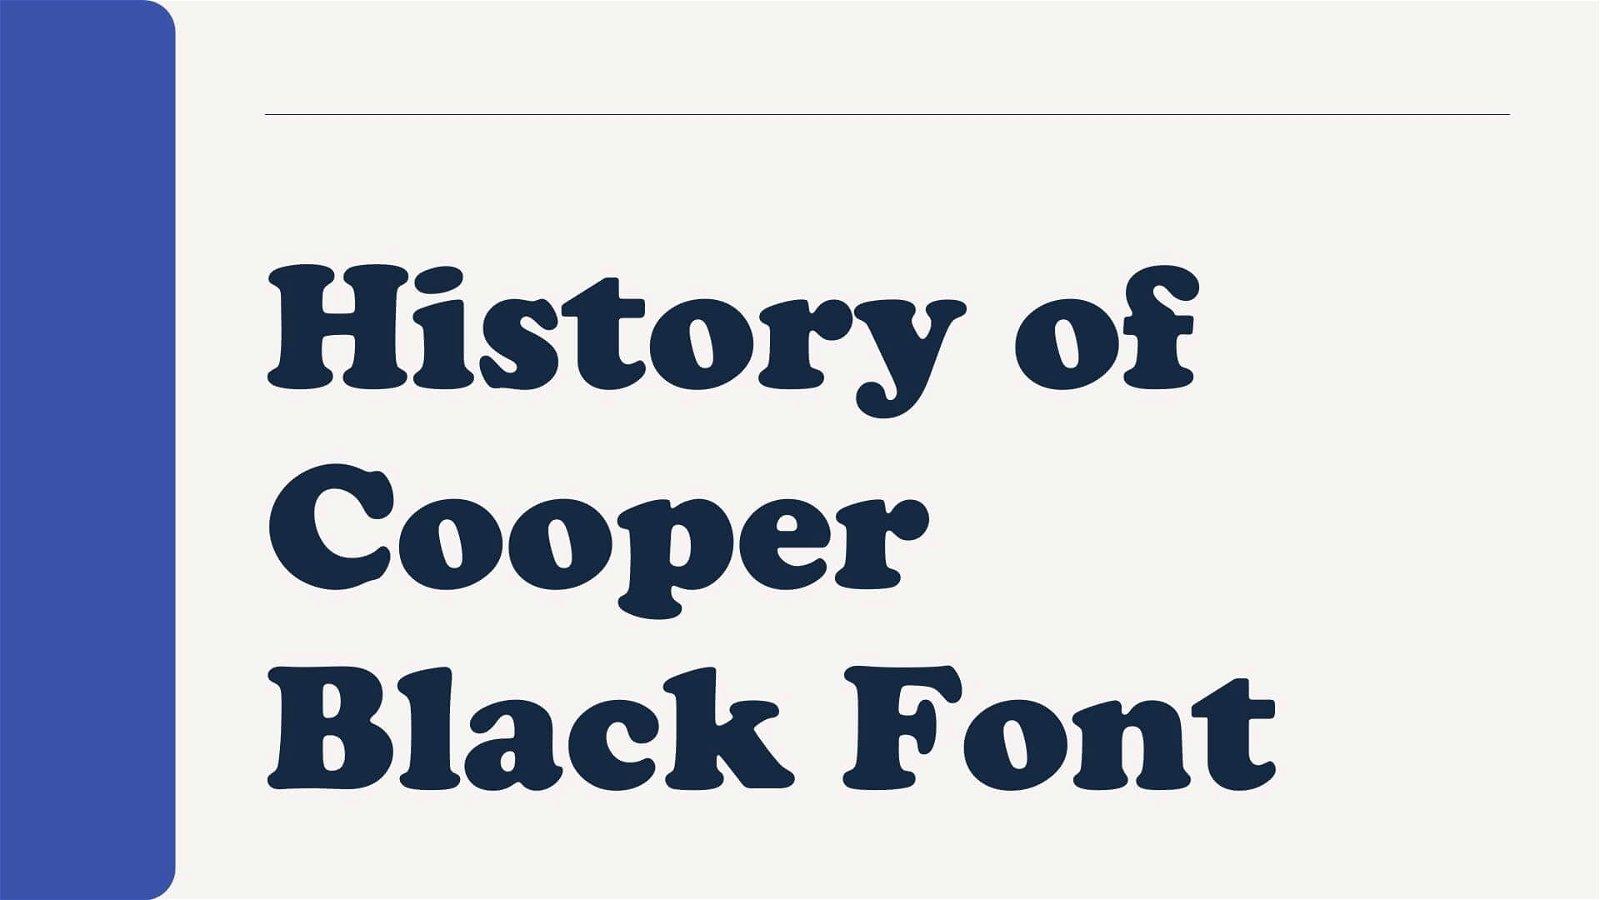 History of Cooper Black Font